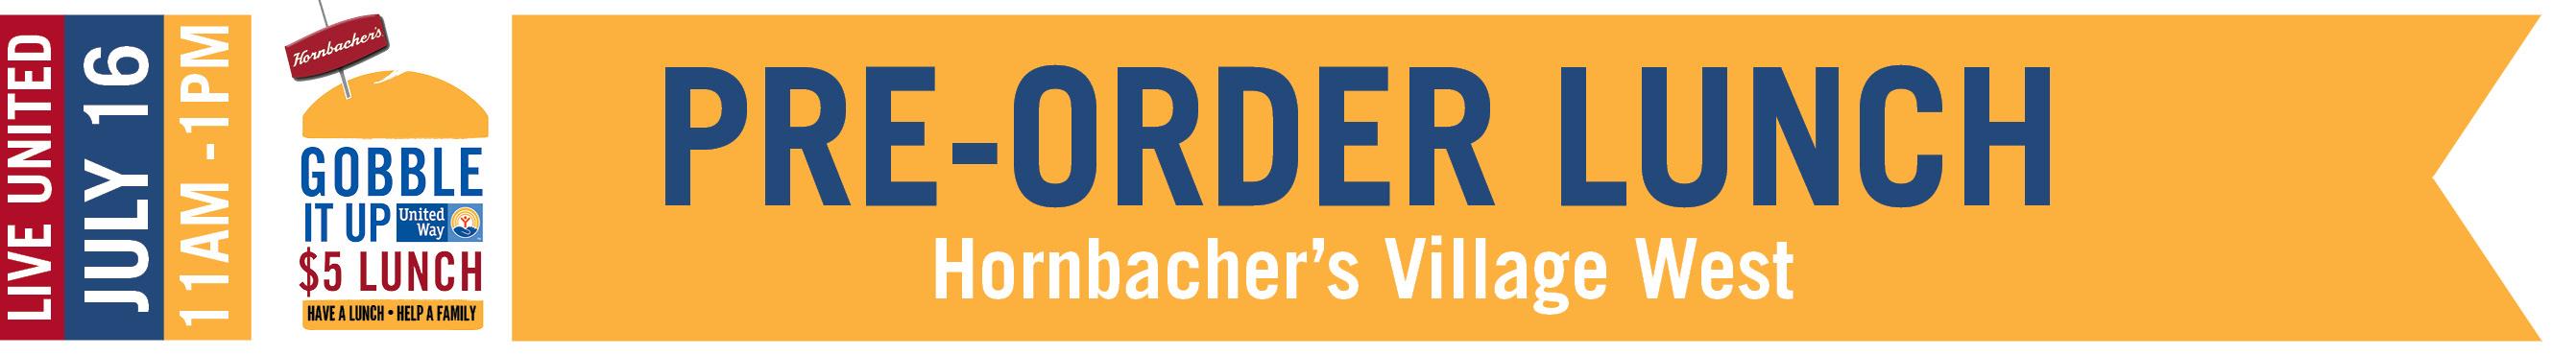 iAttend Banner GIU PreOrders Village West.jpg